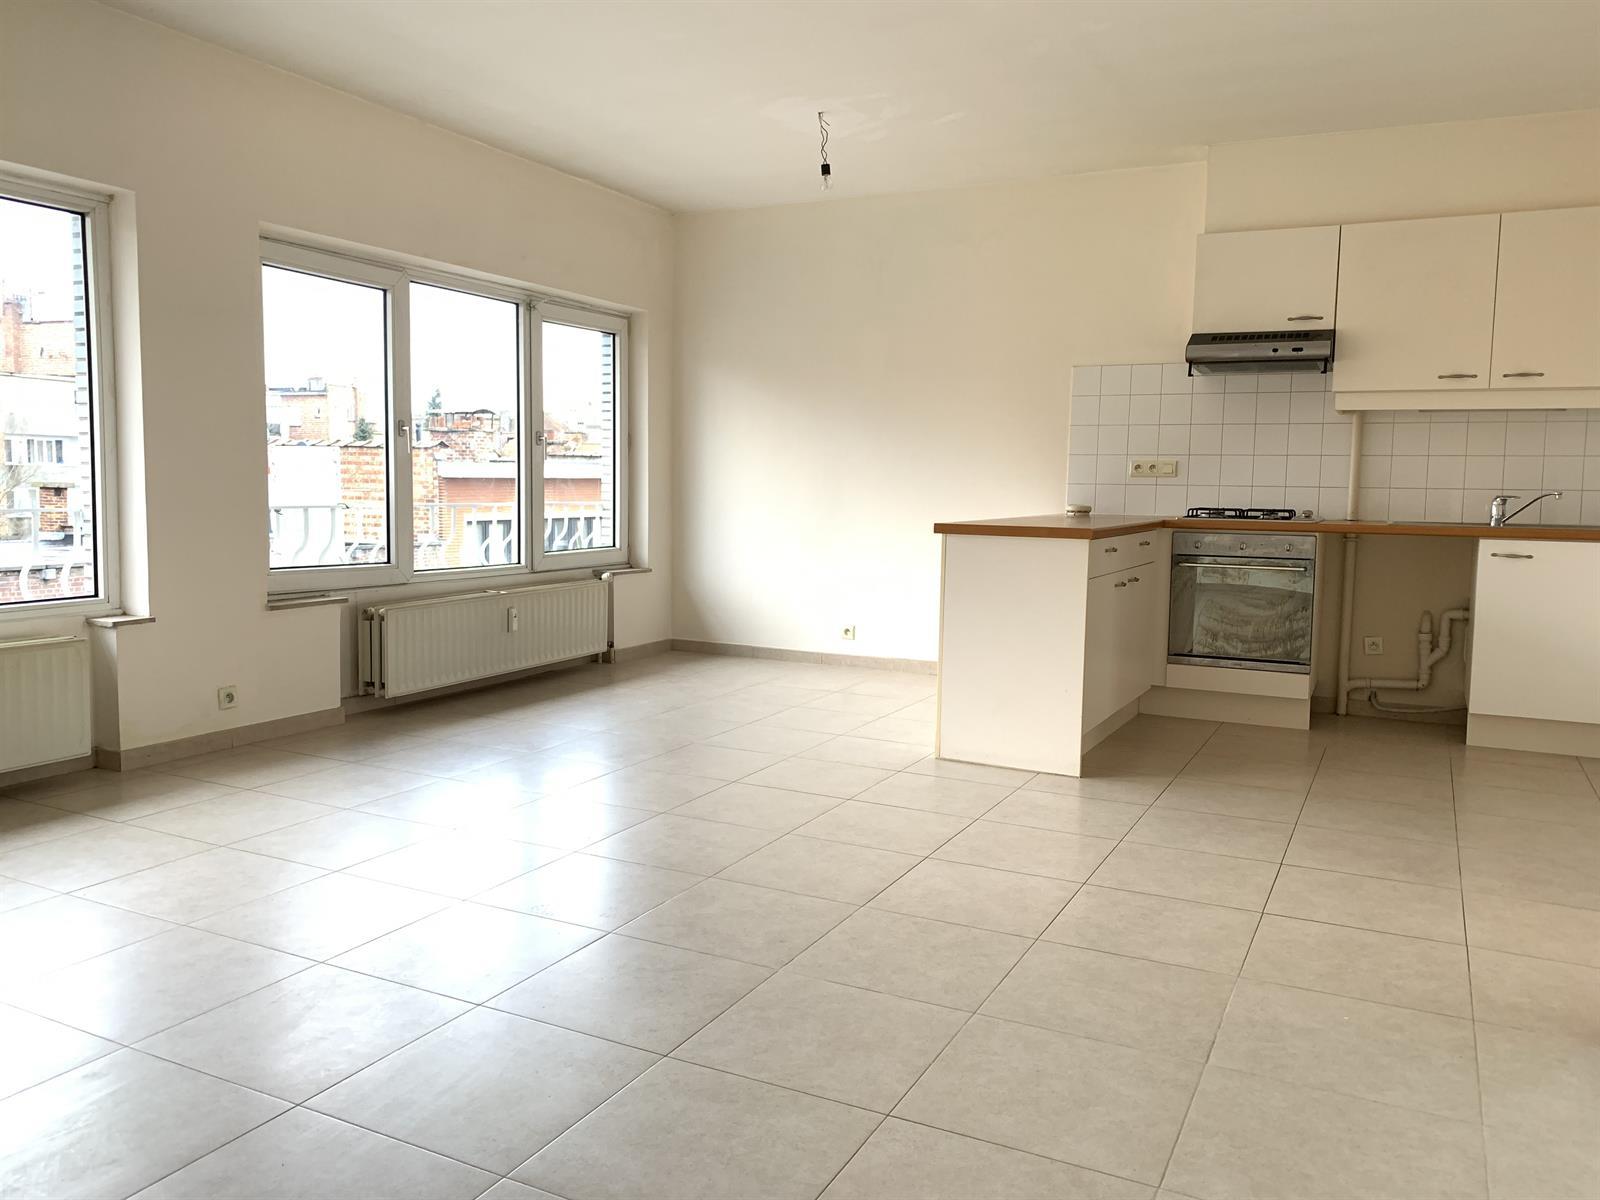 Appartement - Ganshoren - #3973643-1